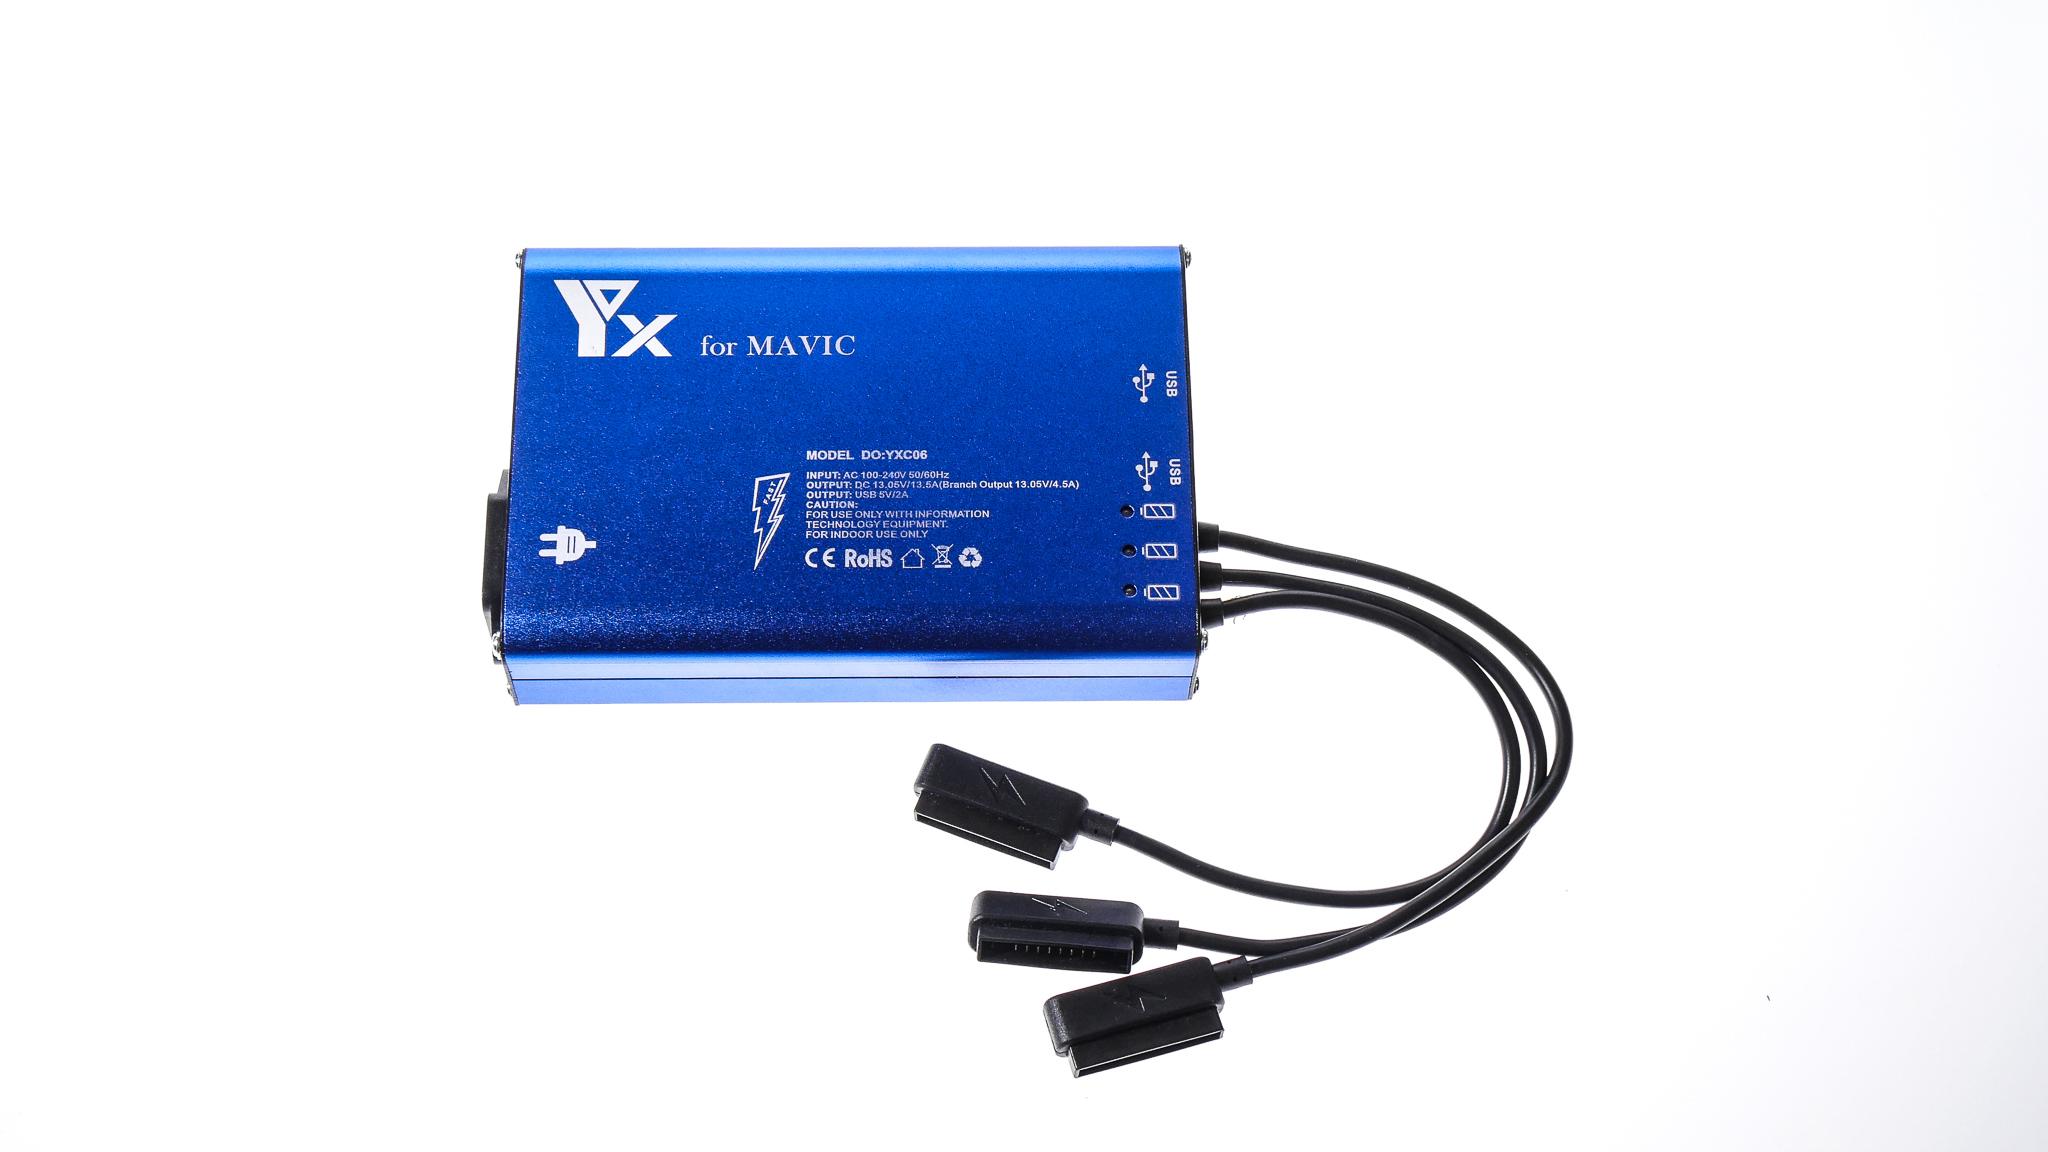 DJI Mavic Pro 5 In 1 Rapid Battery Charger Charging Hub